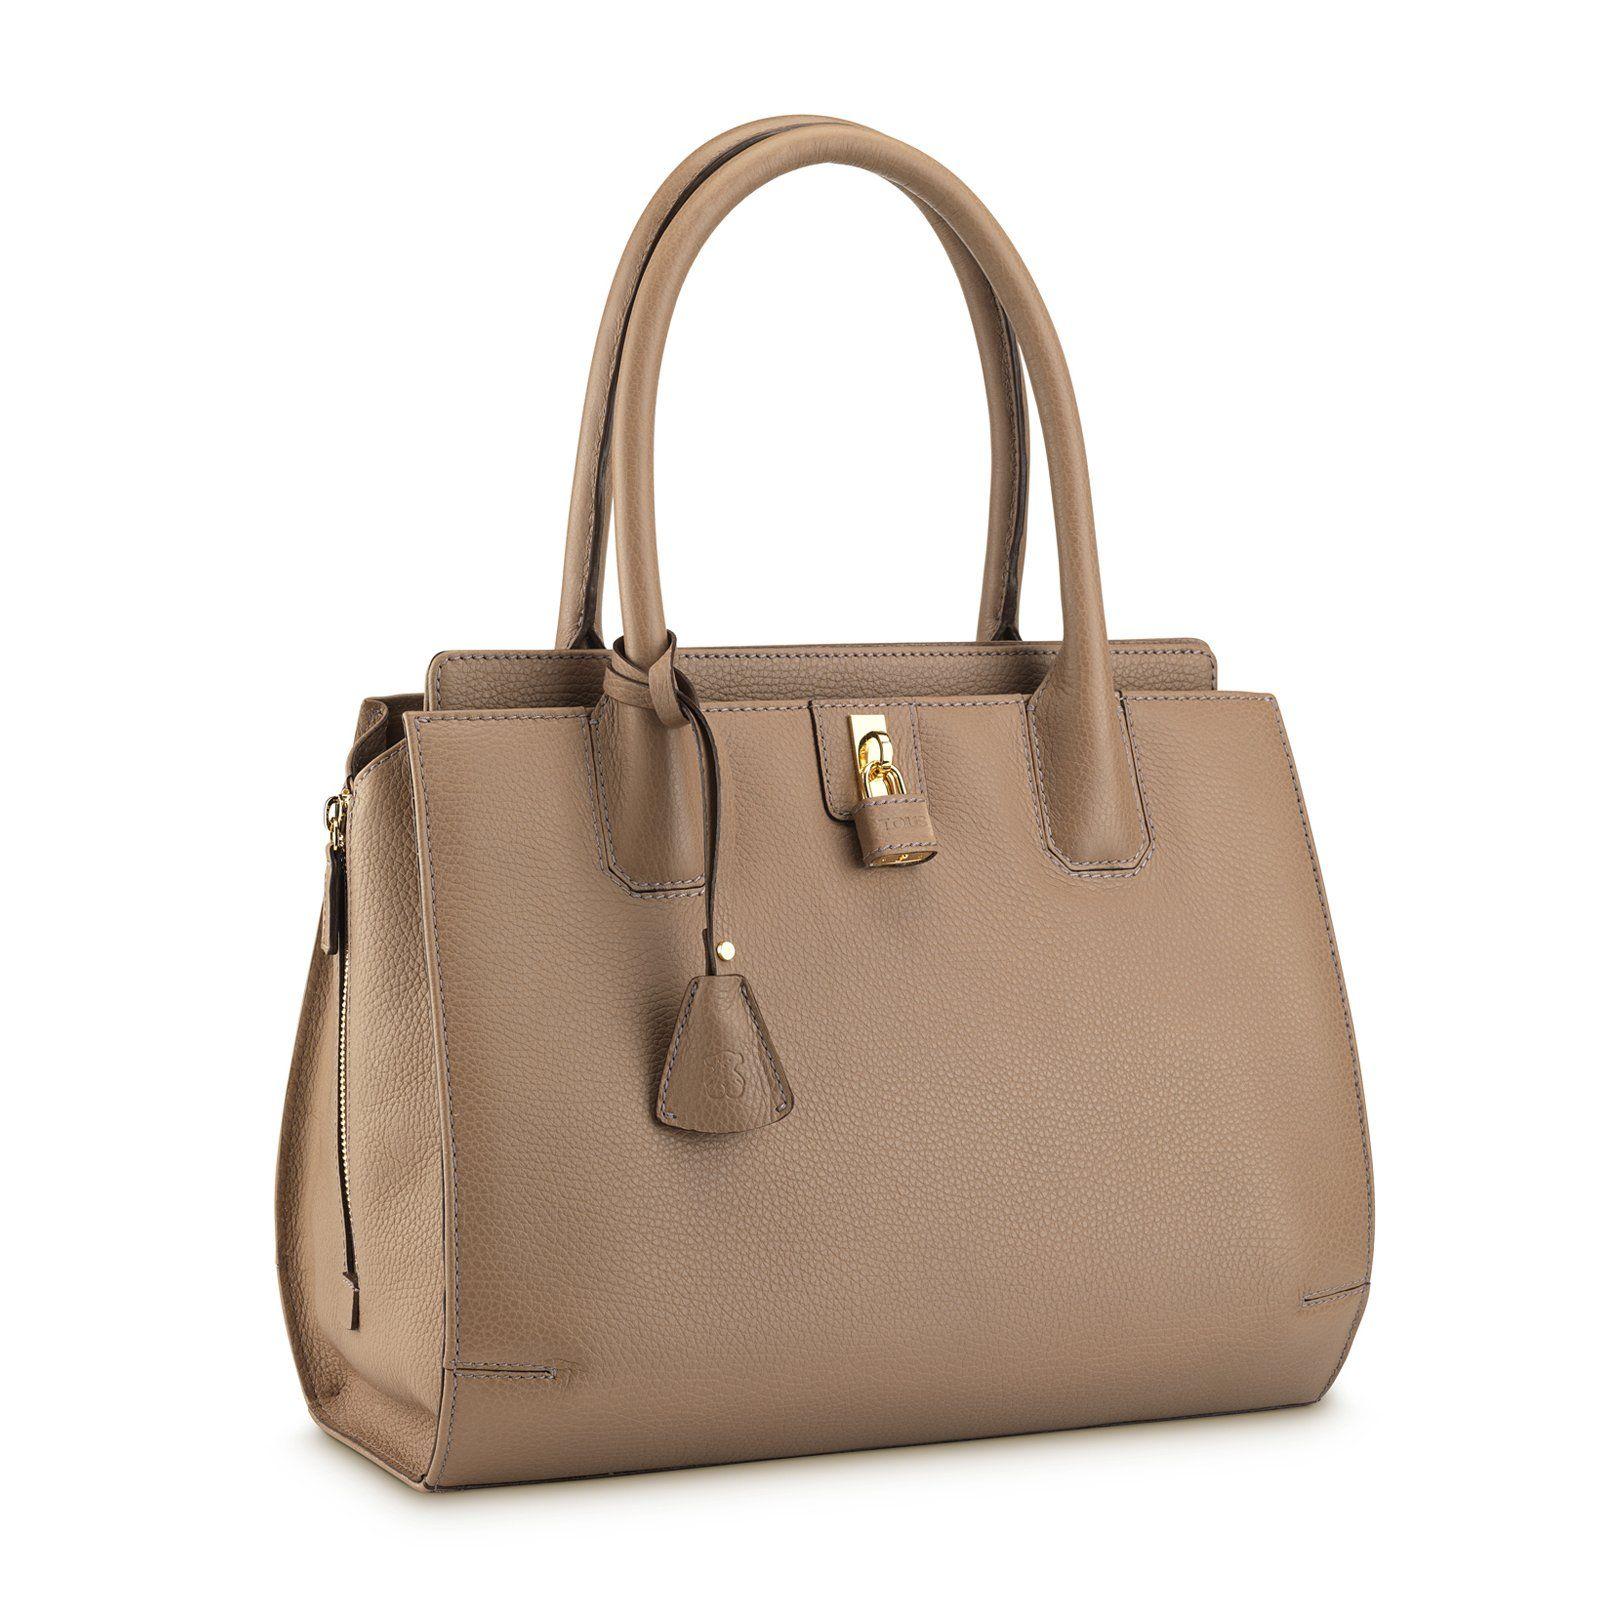 Handbag Tous Pinterest Gentle Mochilas Collection Handbags waaTqBER